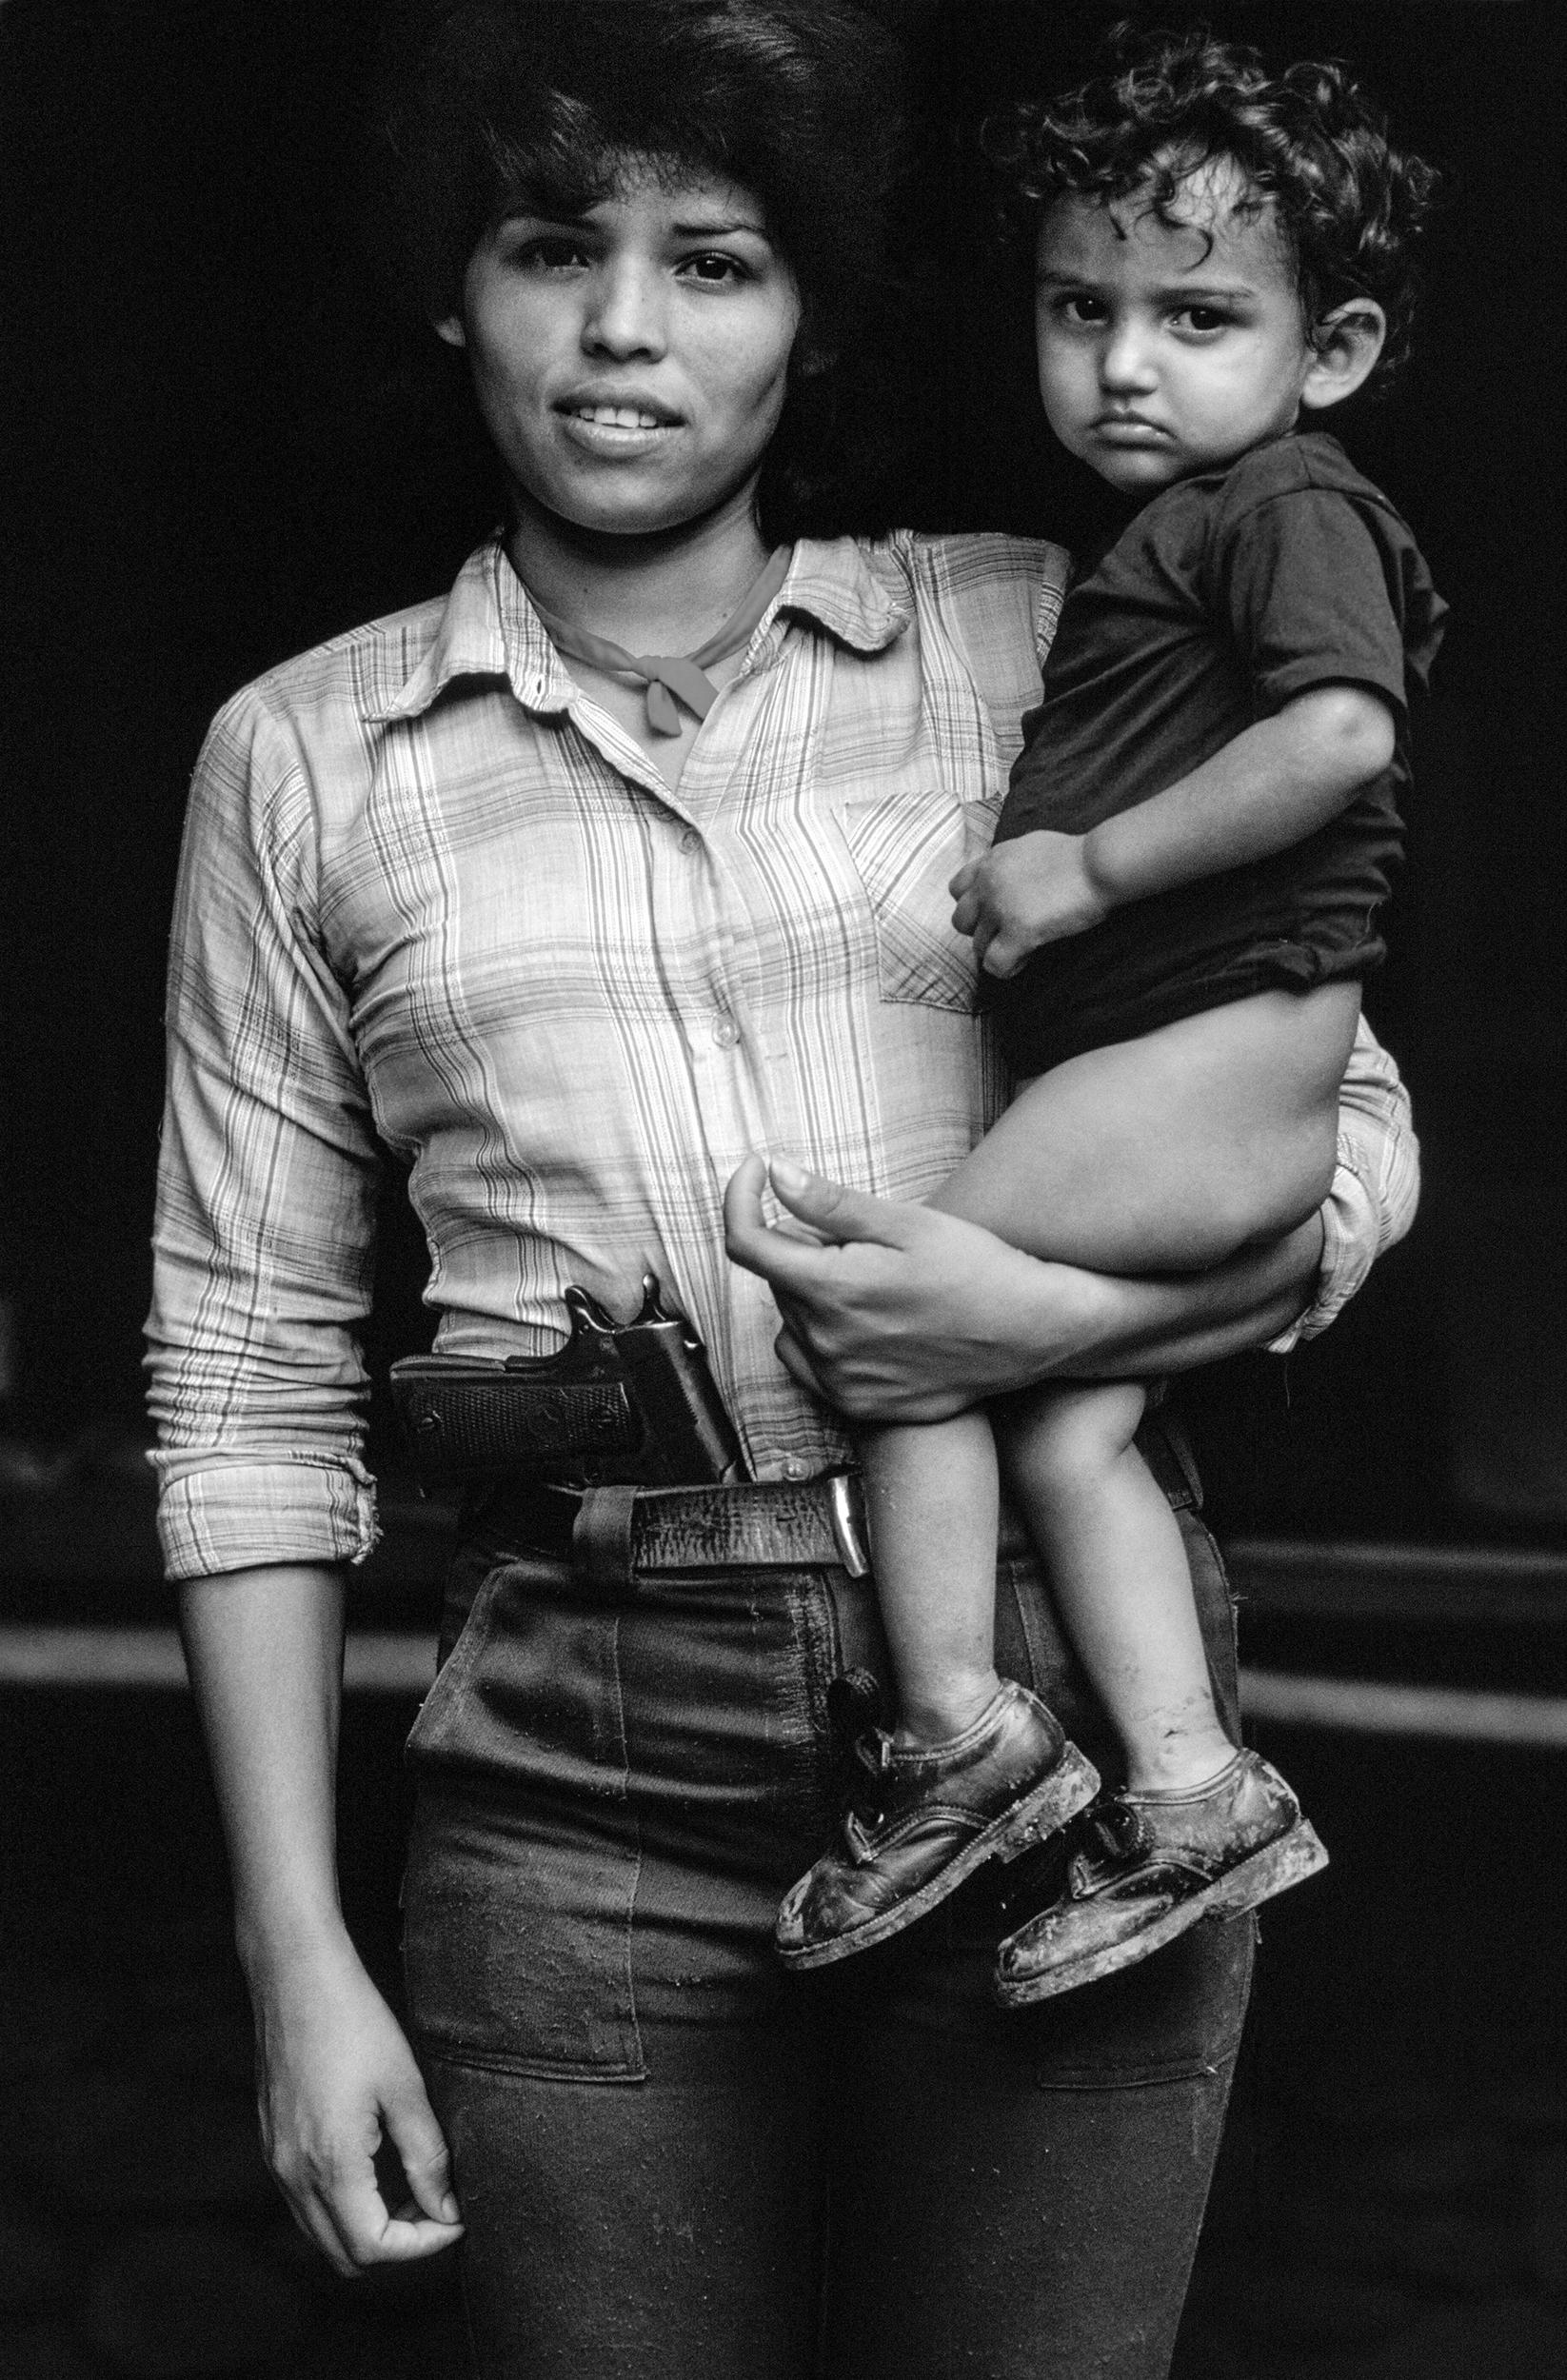 PHOTOGRAPHY AND CONFLICT: MEMORIES OF THE SALVADORAN CIVIL WAR